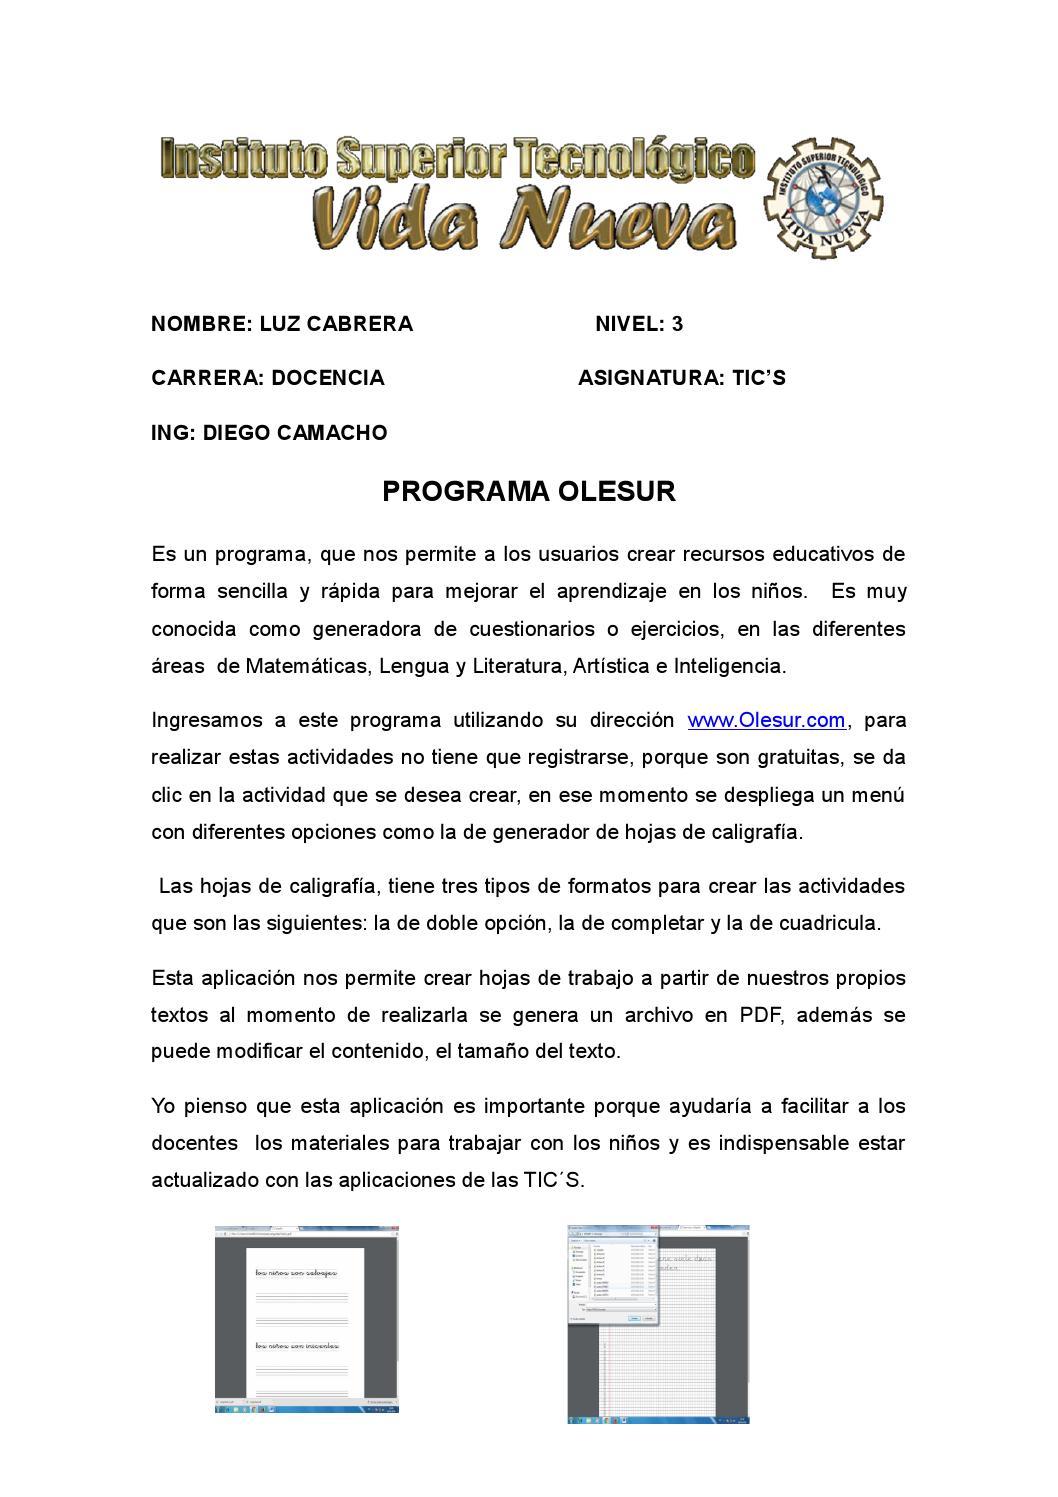 PROGRAMA OLESUR by LUZ AMERICA CABRERA CHAVEZ - issuu